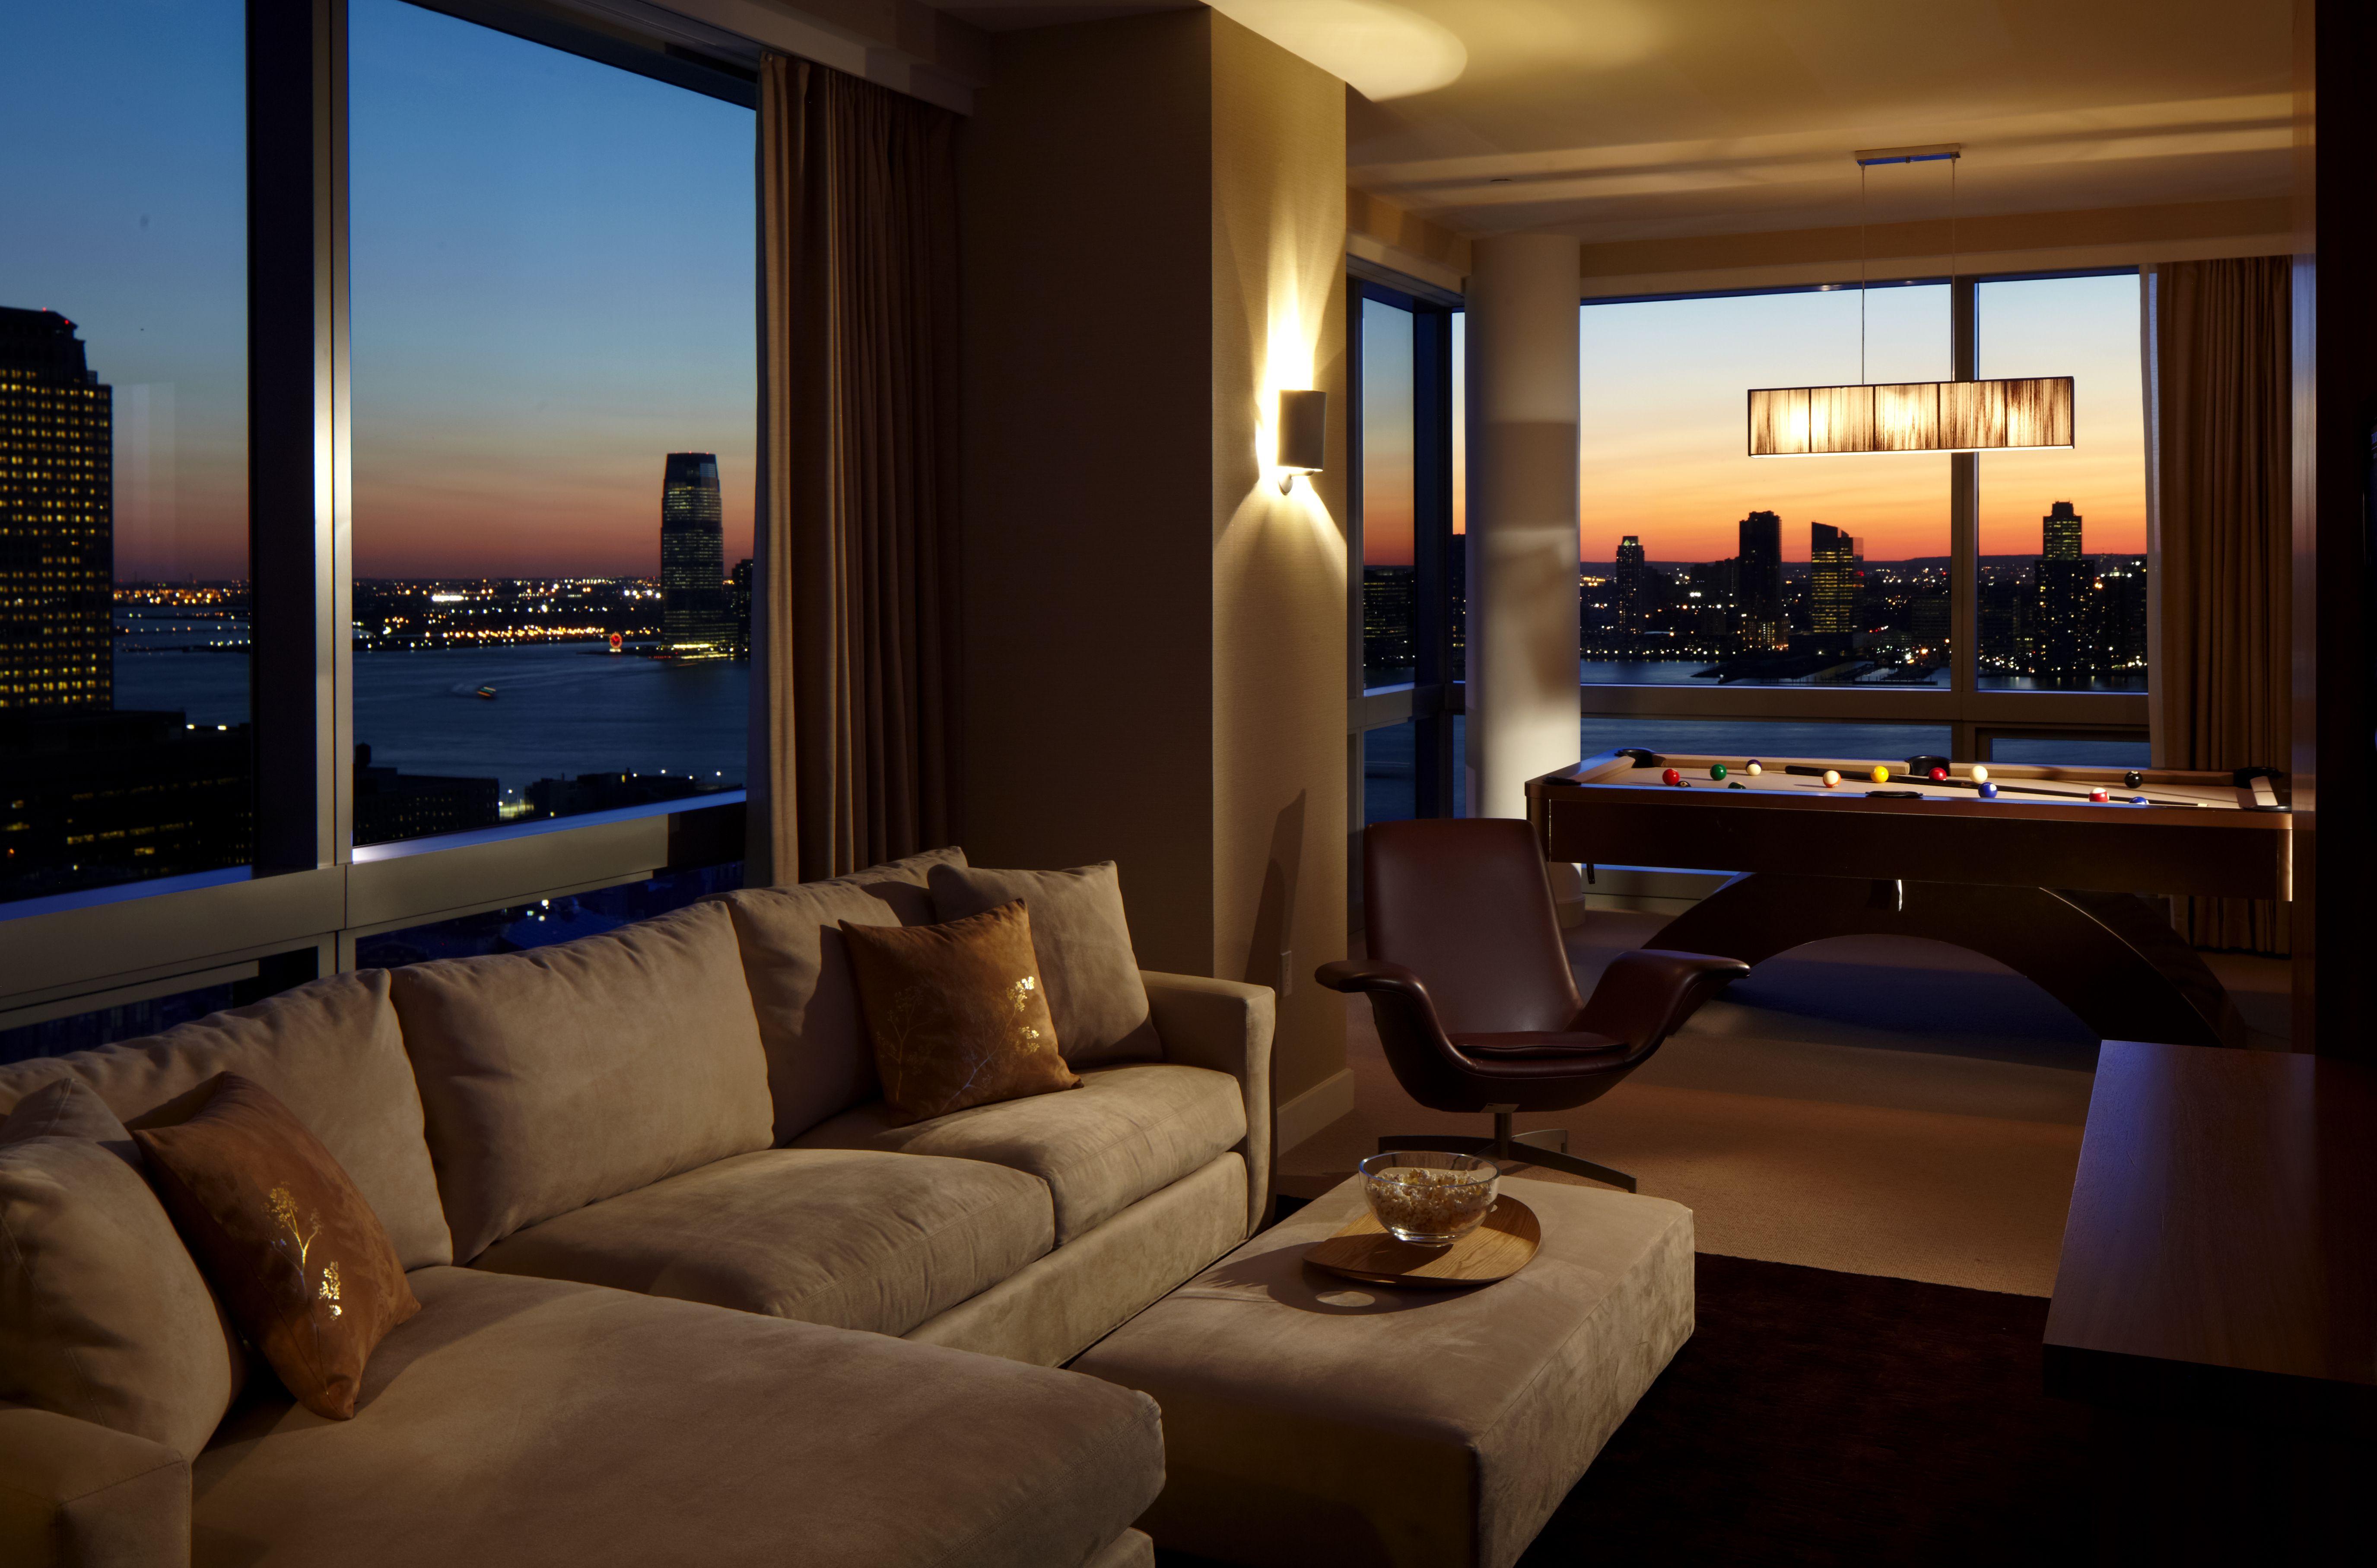 http www trumphotelcollection com penthouse overlooking the city rh pinterest com Trump Tower Trump SoHo Hotel New York